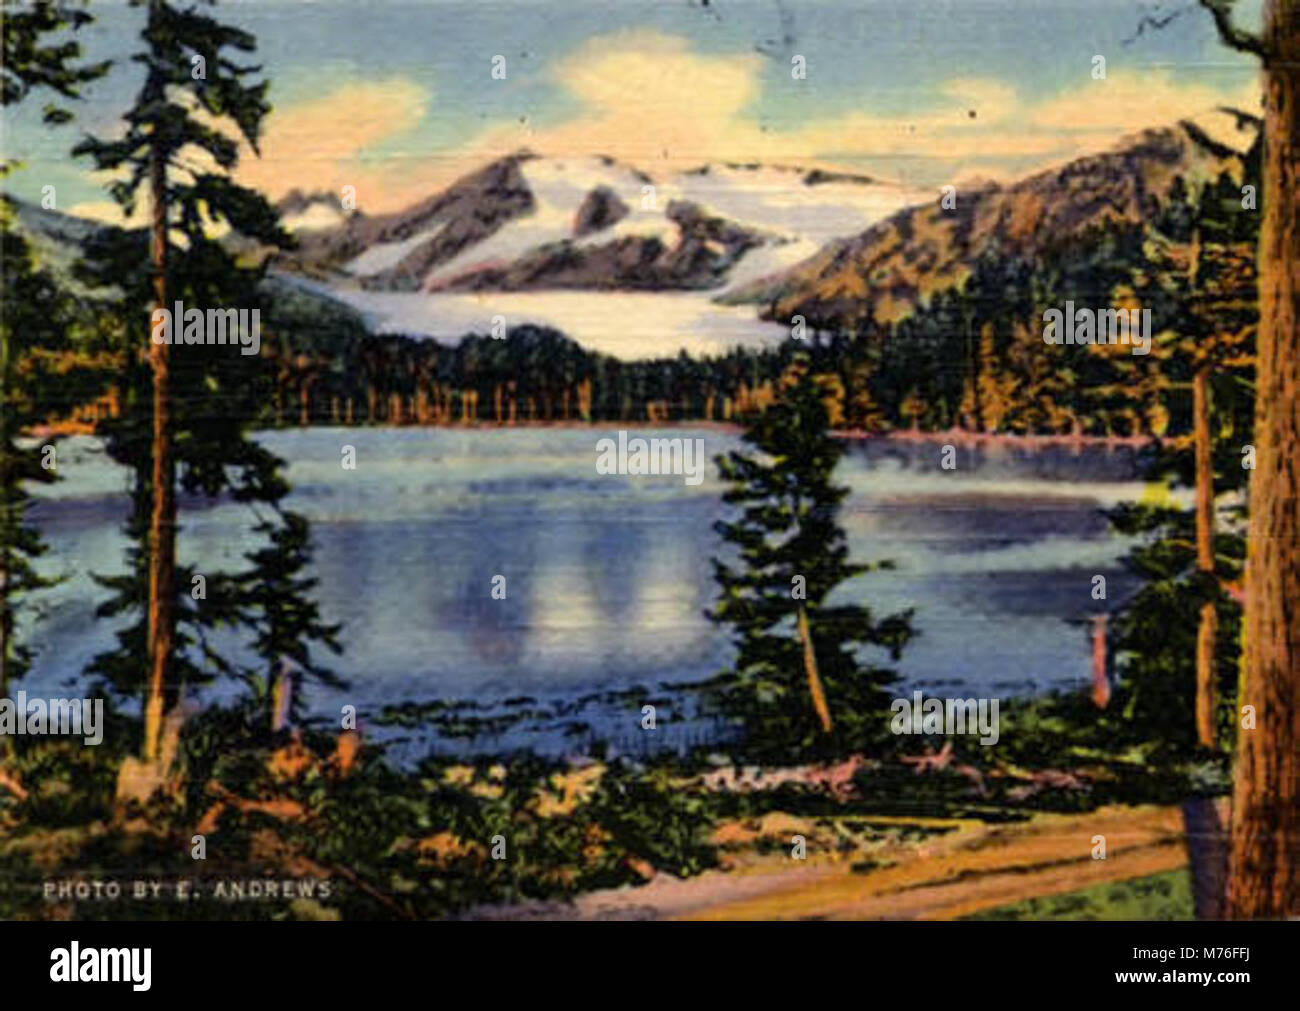 Auk Lake and Mendenhall Glacier near Juneau (NBY 430843) - Stock Image